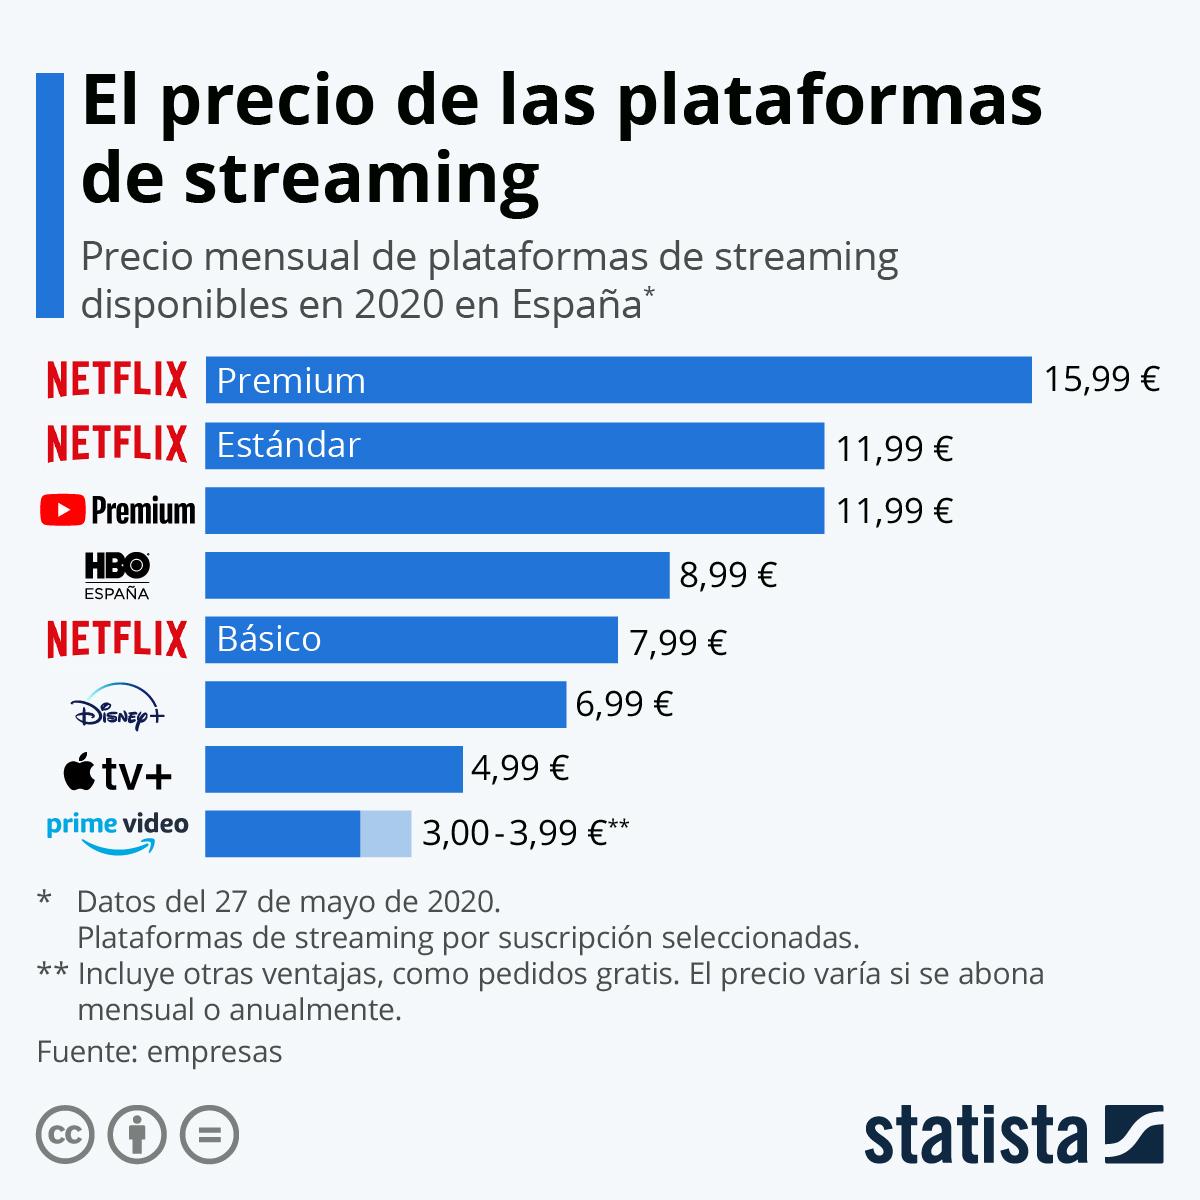 Precio de las plataformas de streaming #infografia #infographic